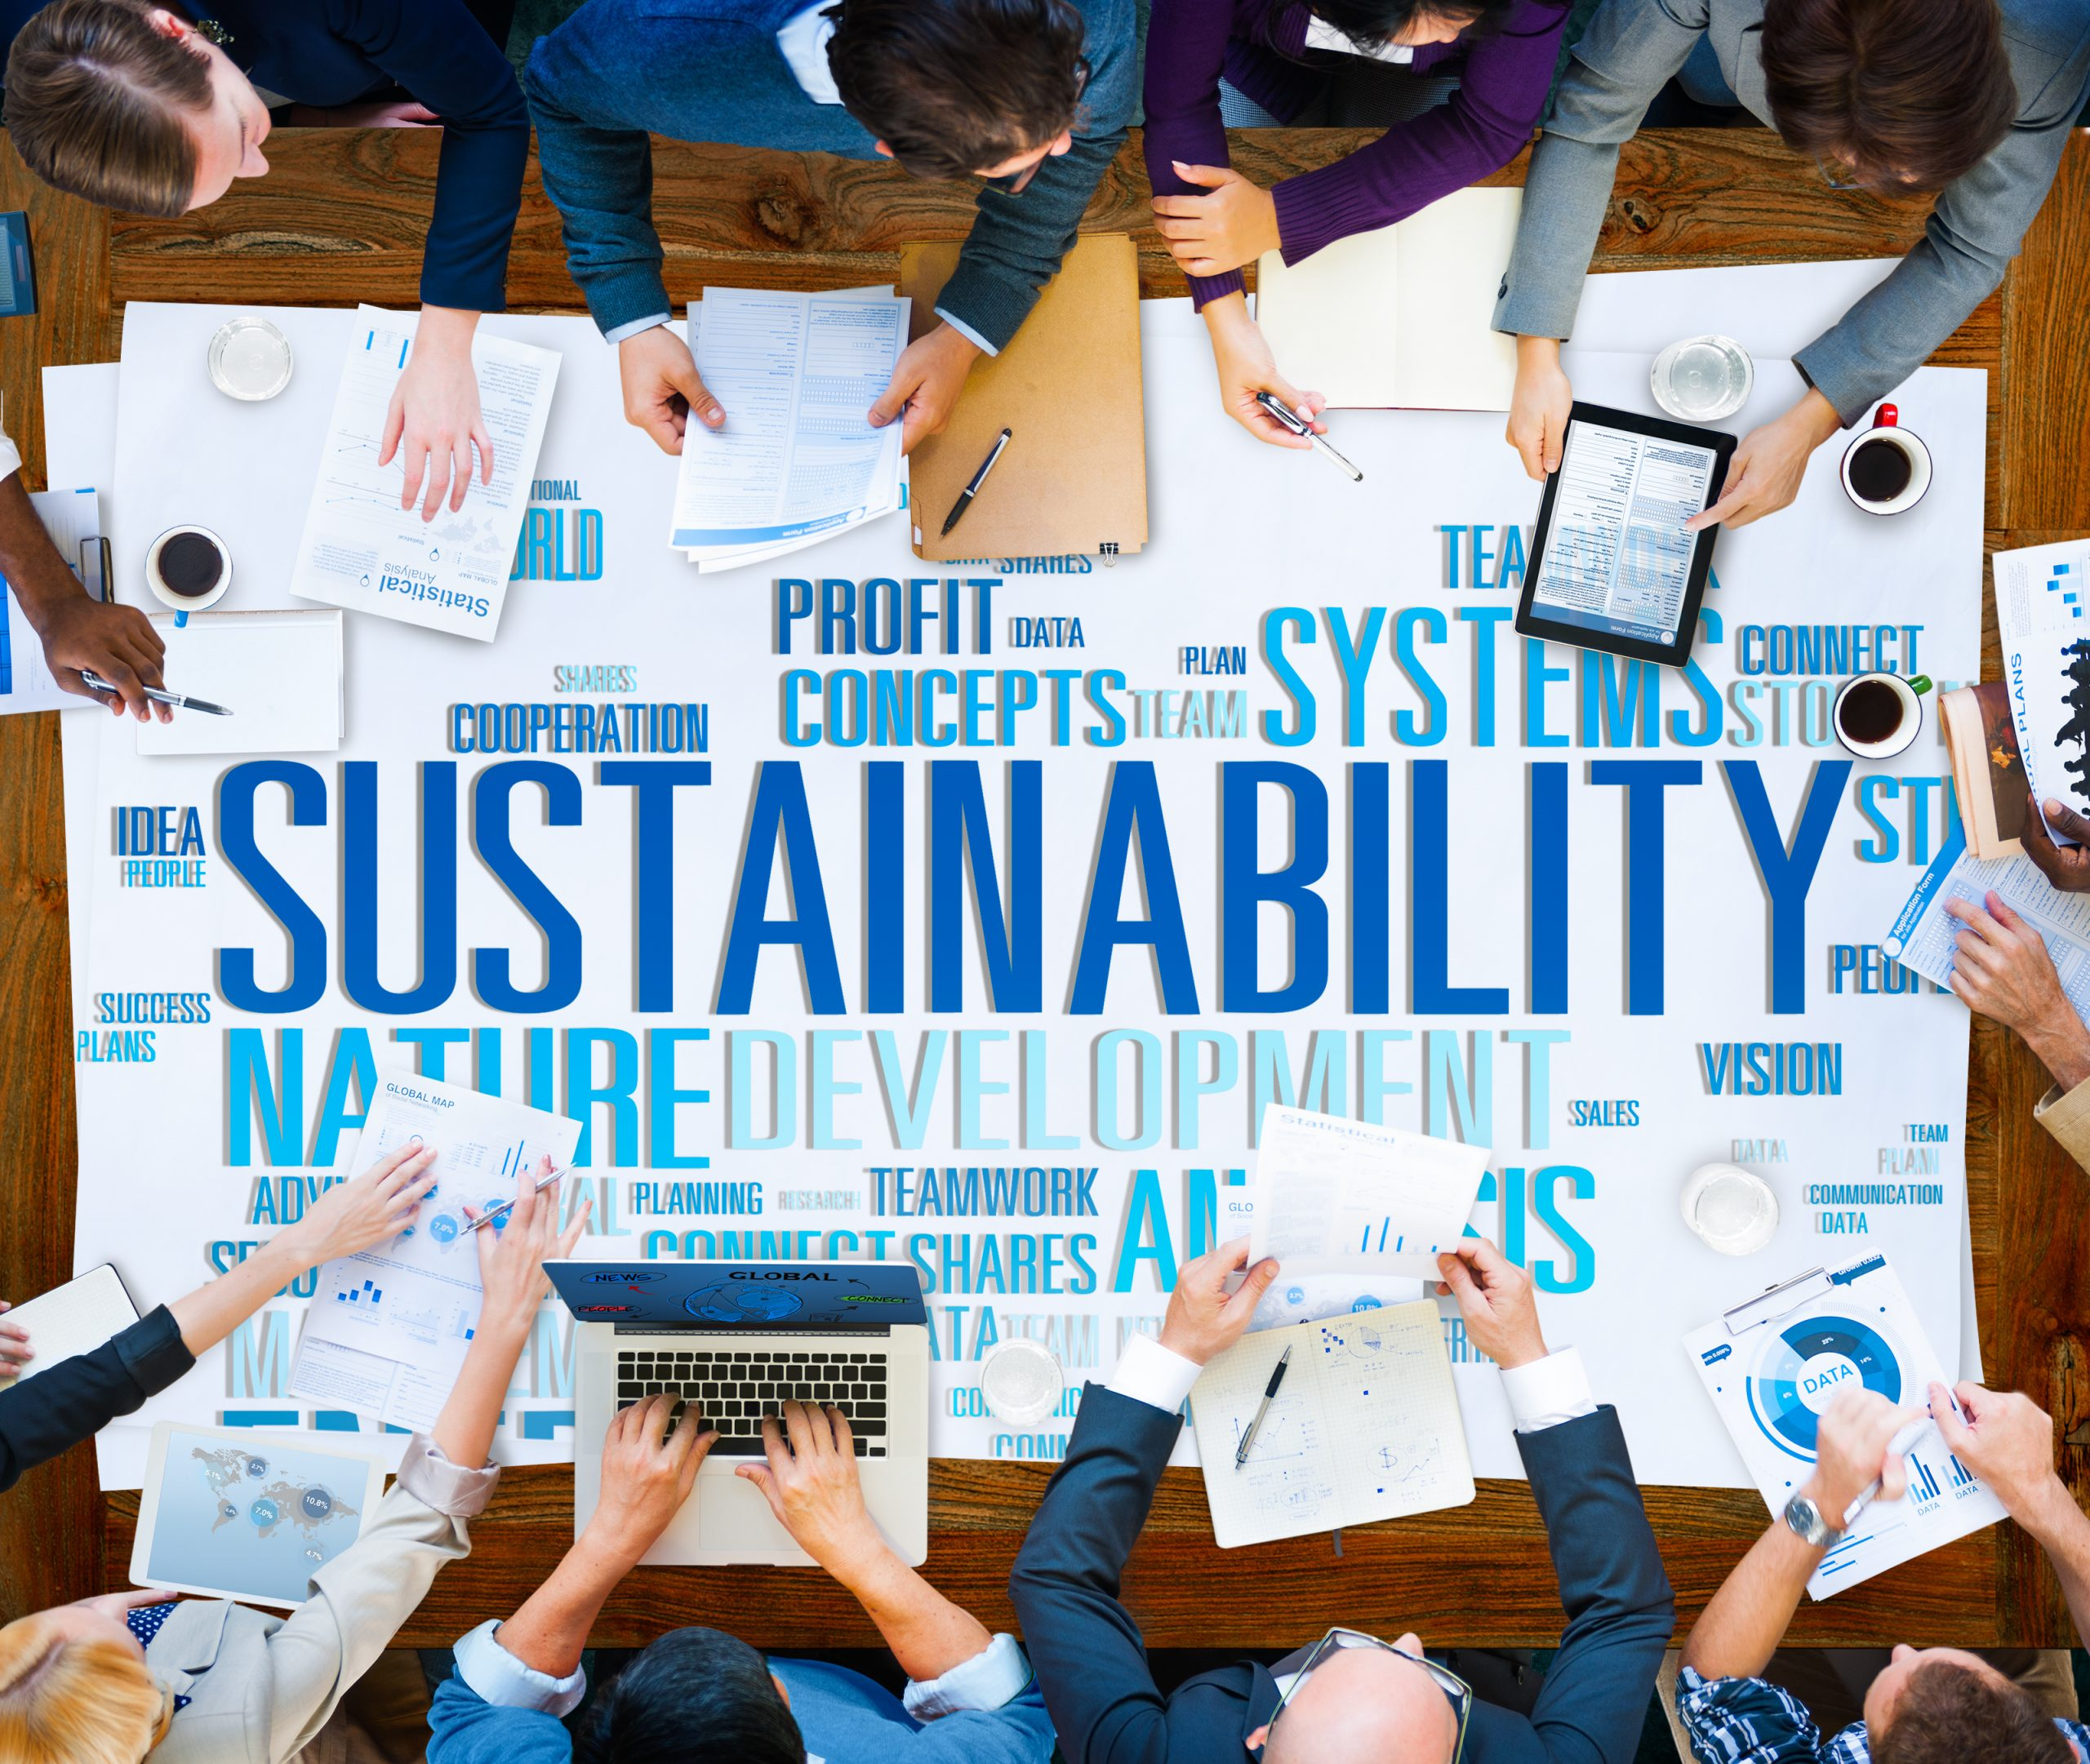 brainstorm sustainable options